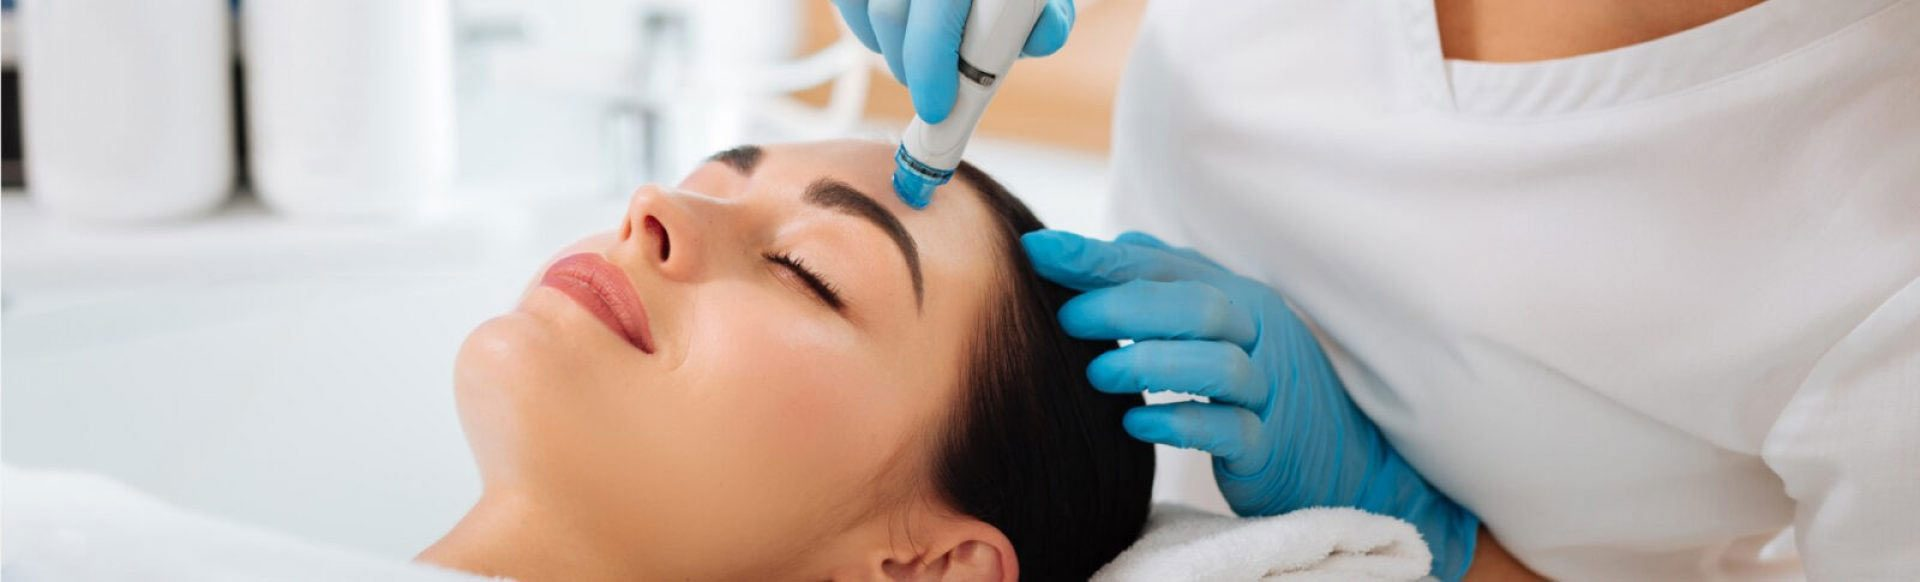 Innovative-Aesthetics-medical-spa-Services-Hydra-Facial